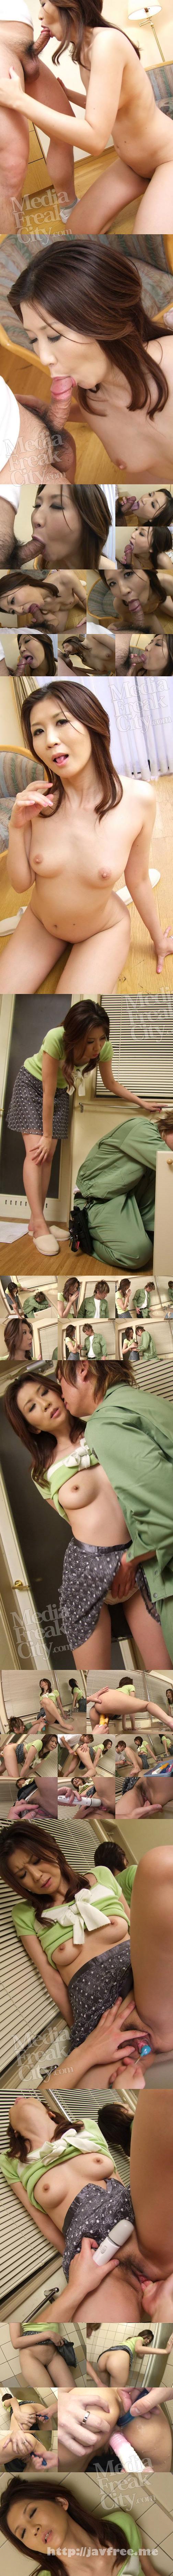 [SKY 159] 好色妻降臨 Vol.7 : 吉岡奈々子 好色妻降臨 吉岡奈々子 SKY Nanako Yoshioka Dirty Minded Wife Advent